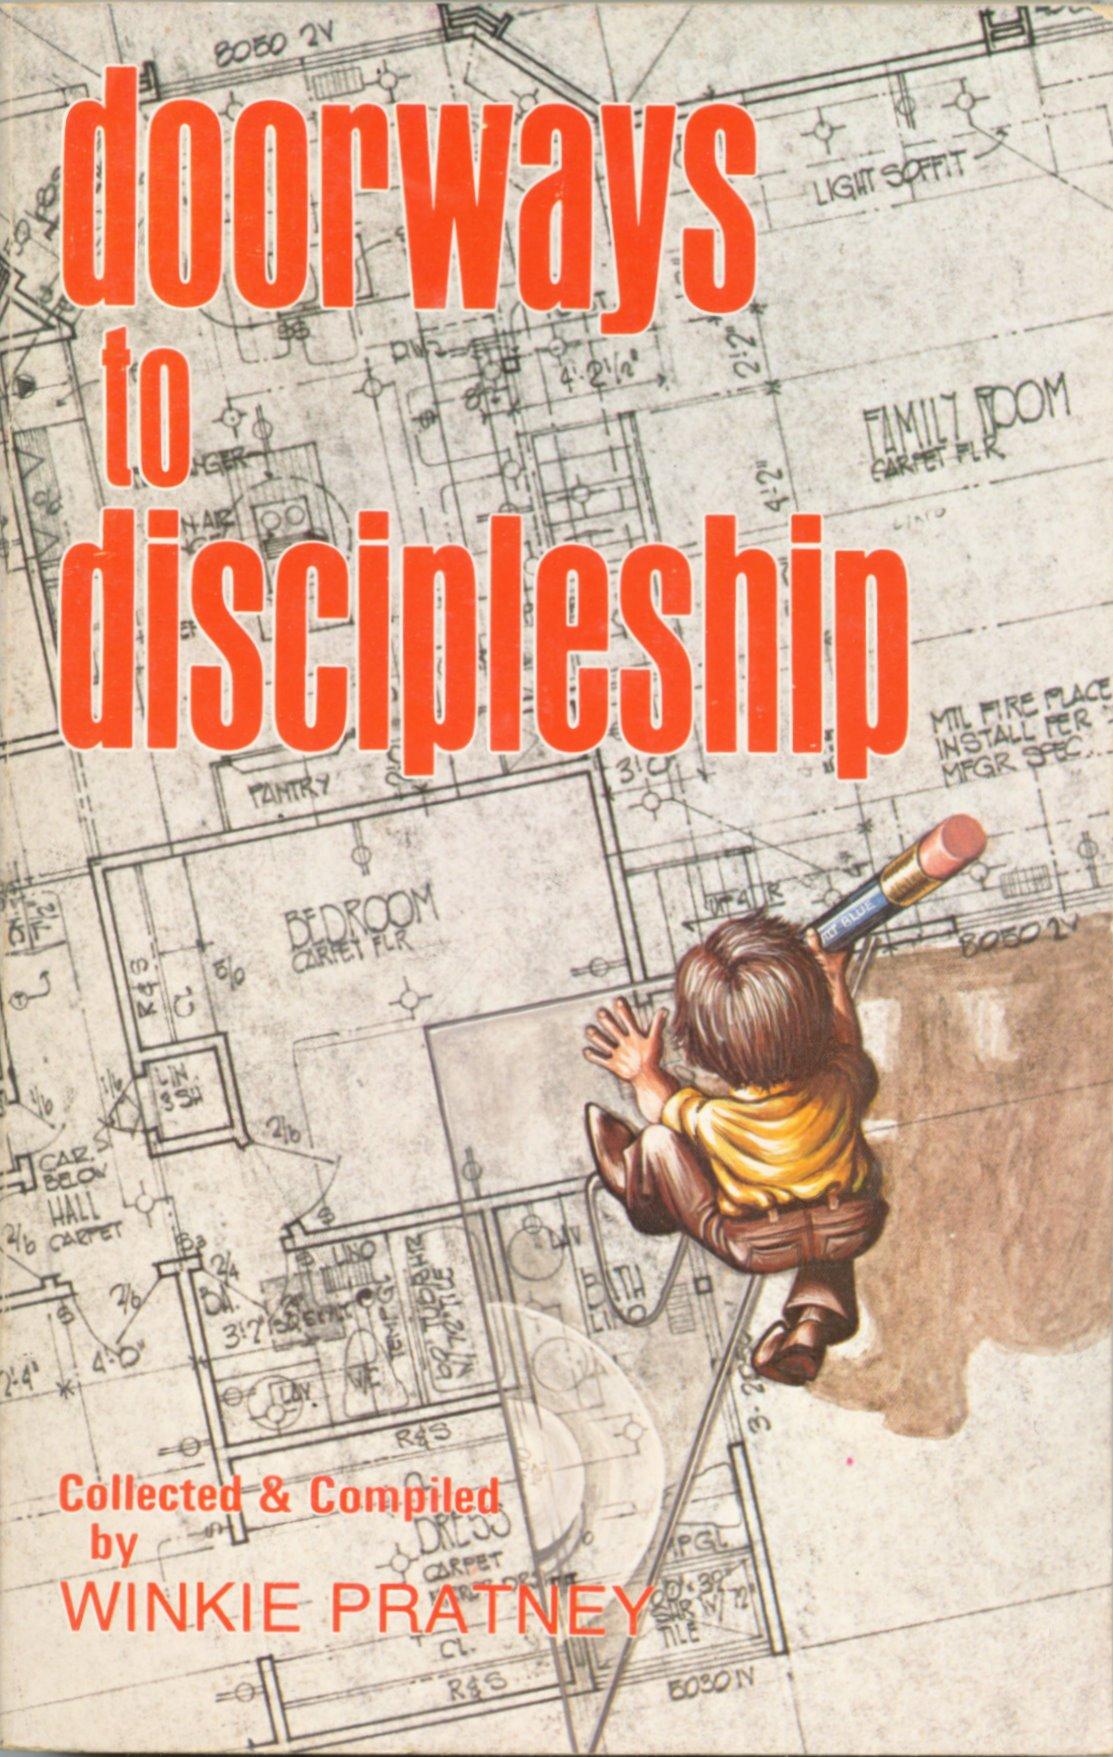 Doorways to Discipleship: Winkie Pratney: 9780871231062: Amazon.com: Books